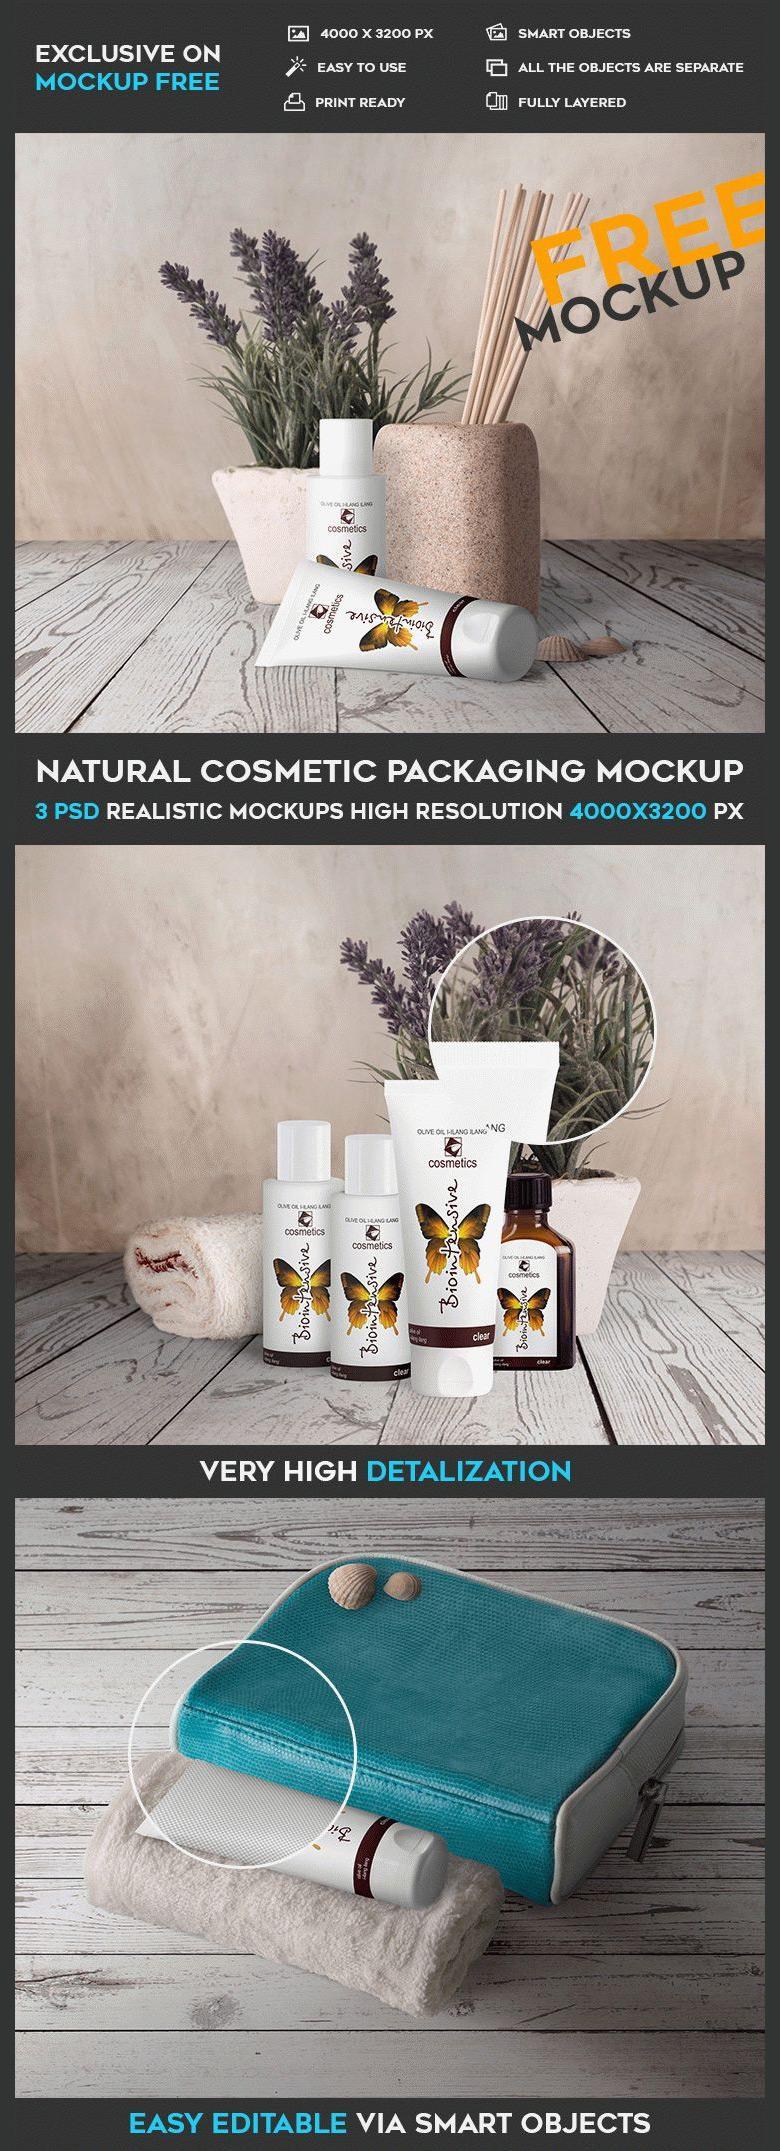 Natural Cosmetic Packaging Mockup Set